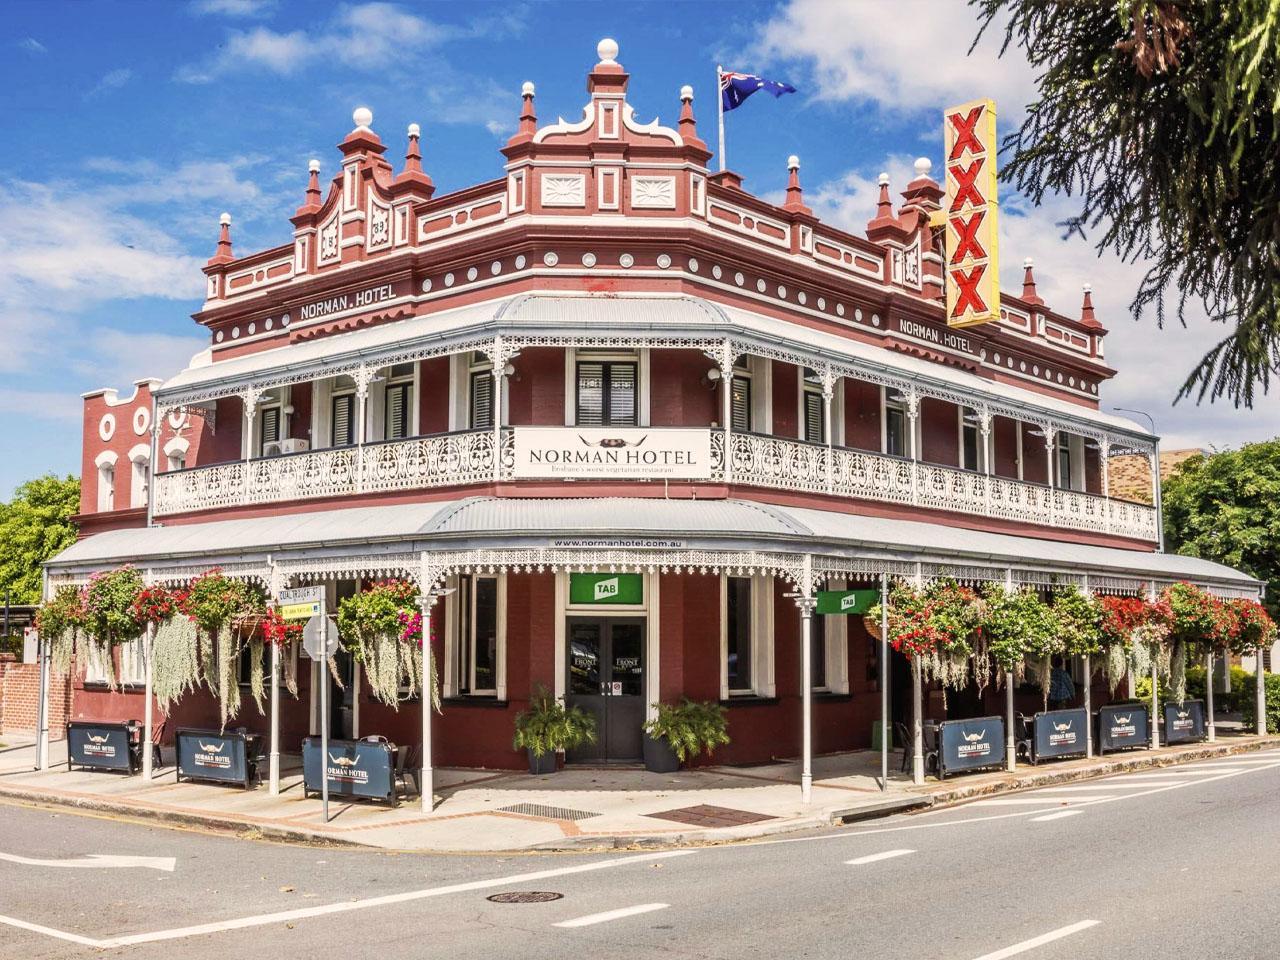 Normal Hotel heritage building